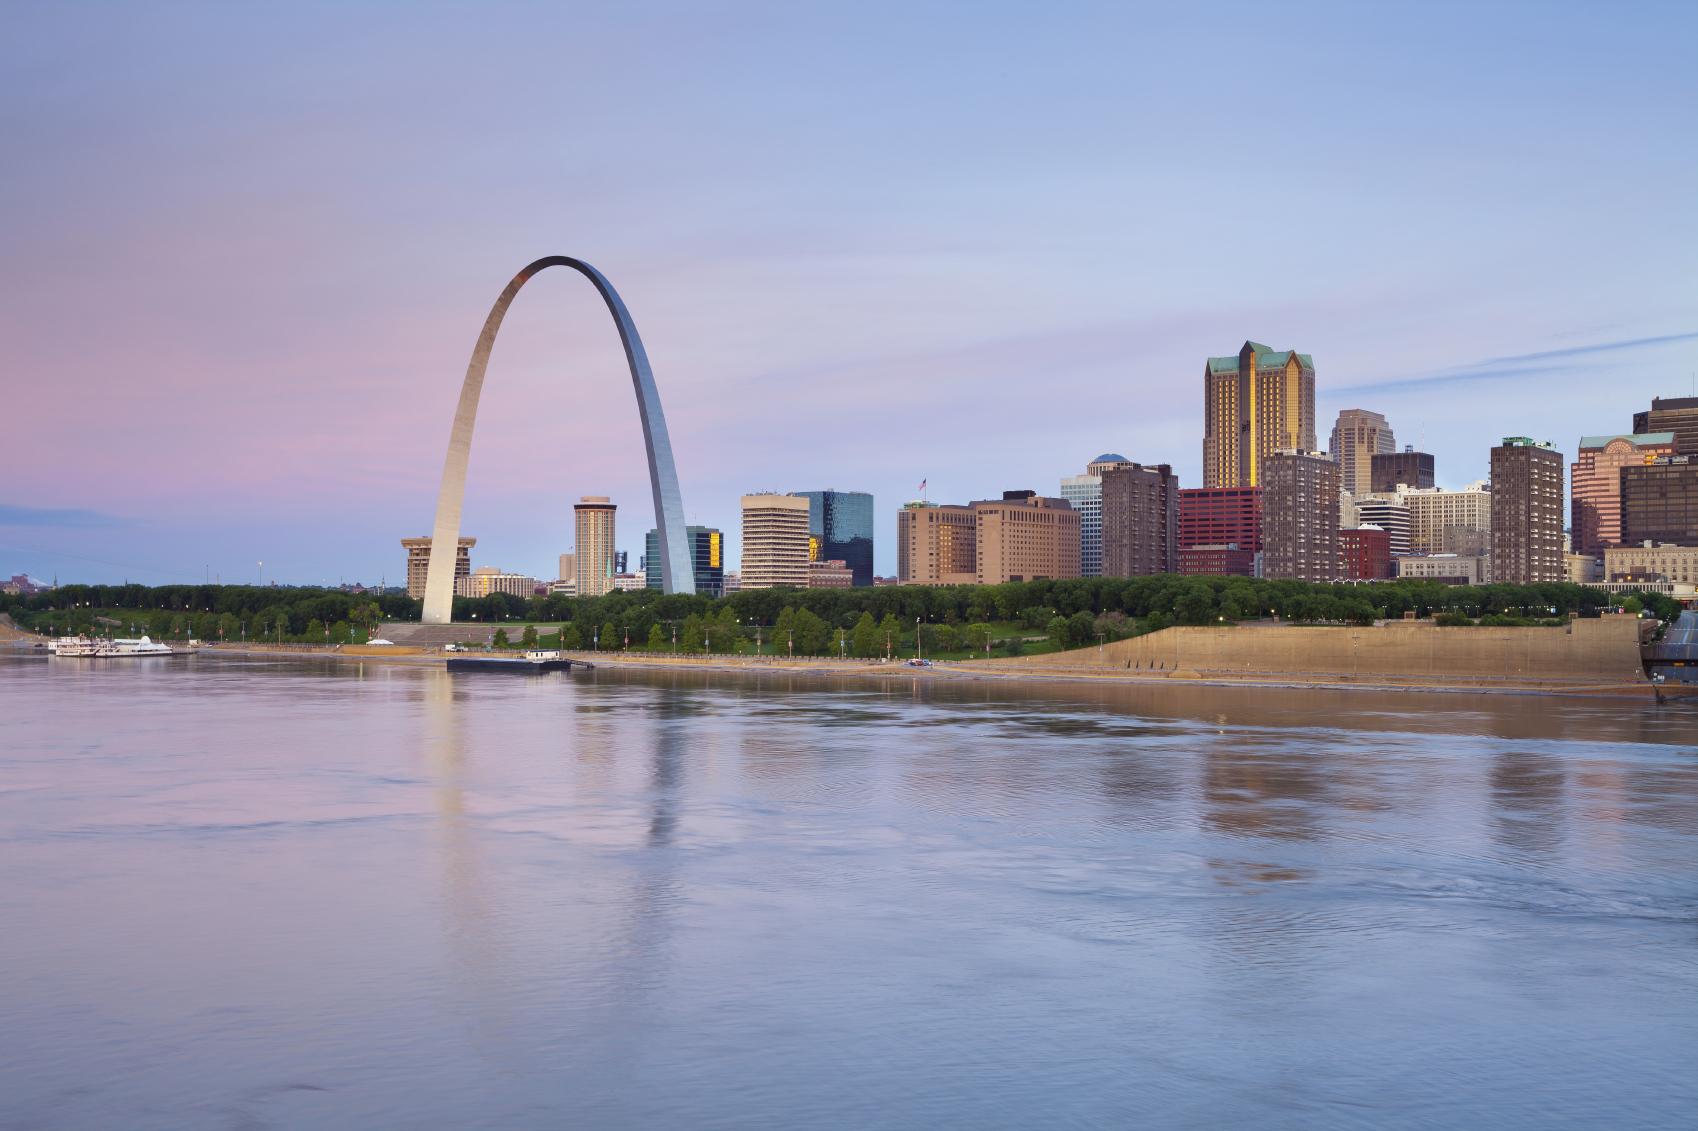 St. Louis, MO Regional Banking Center